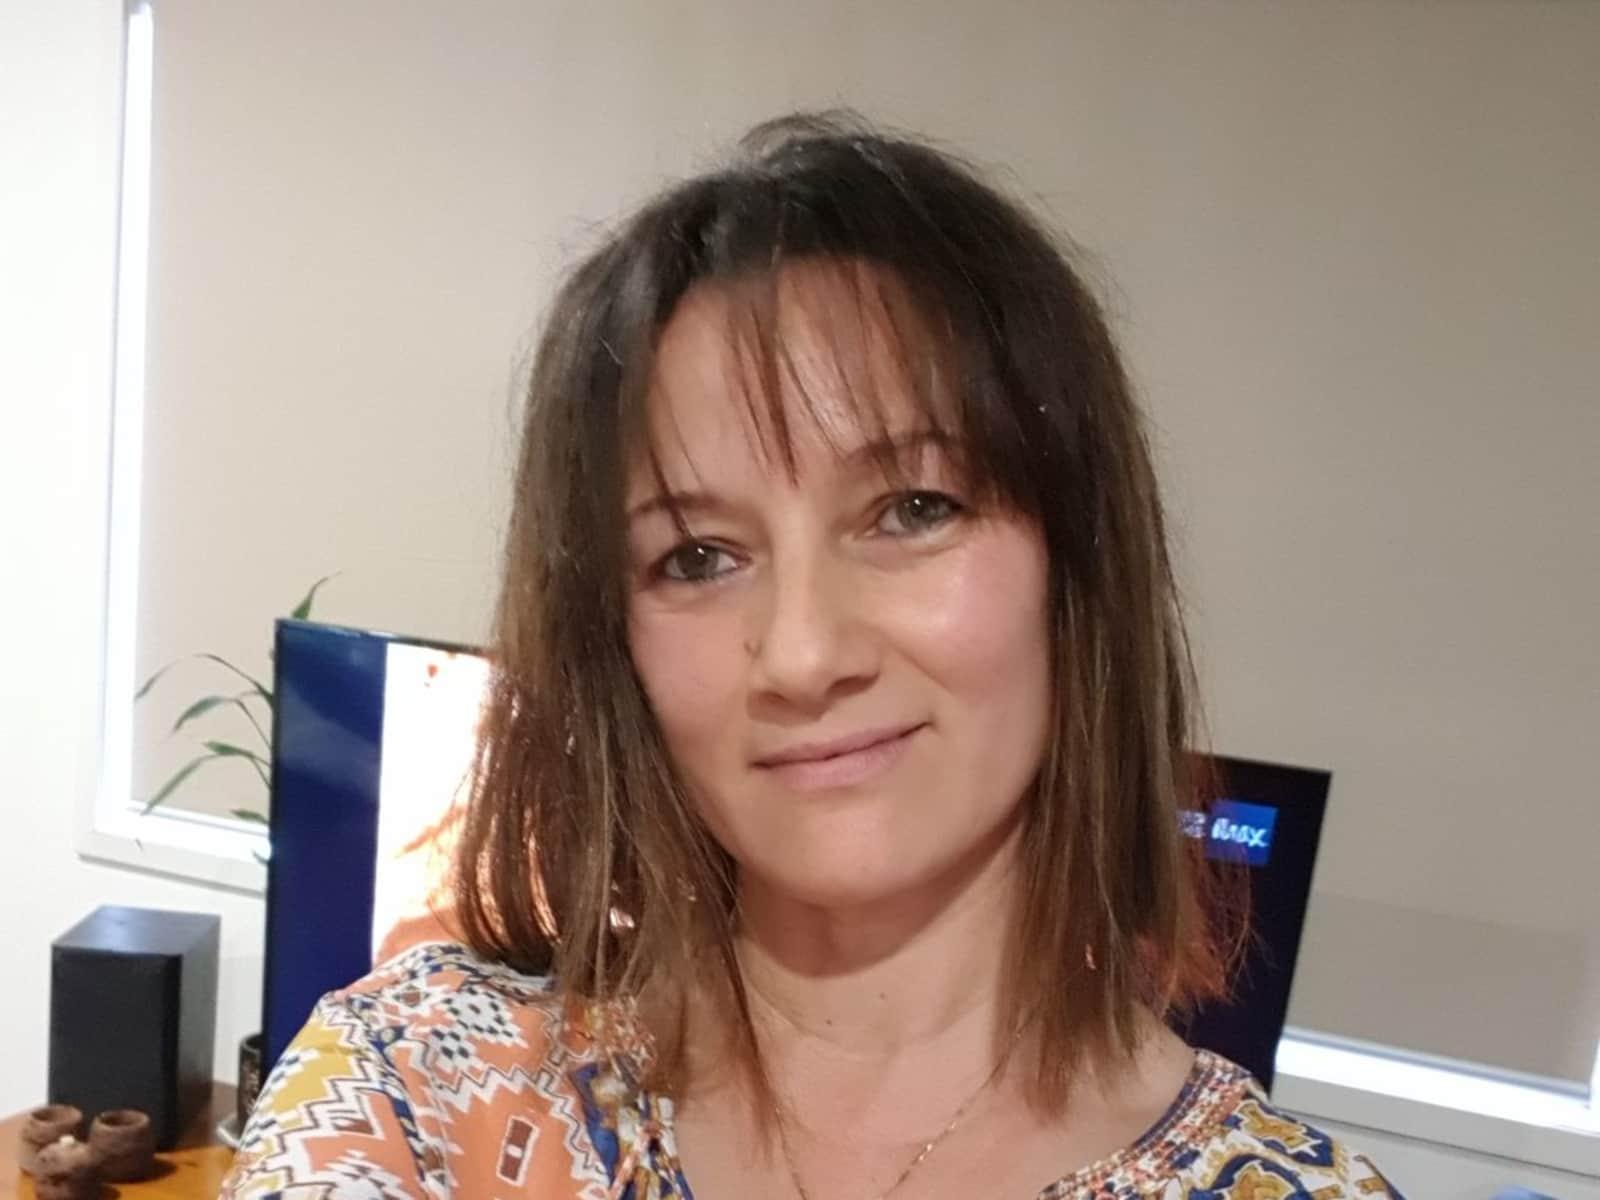 Celeste from Brisbane, Queensland, Australia